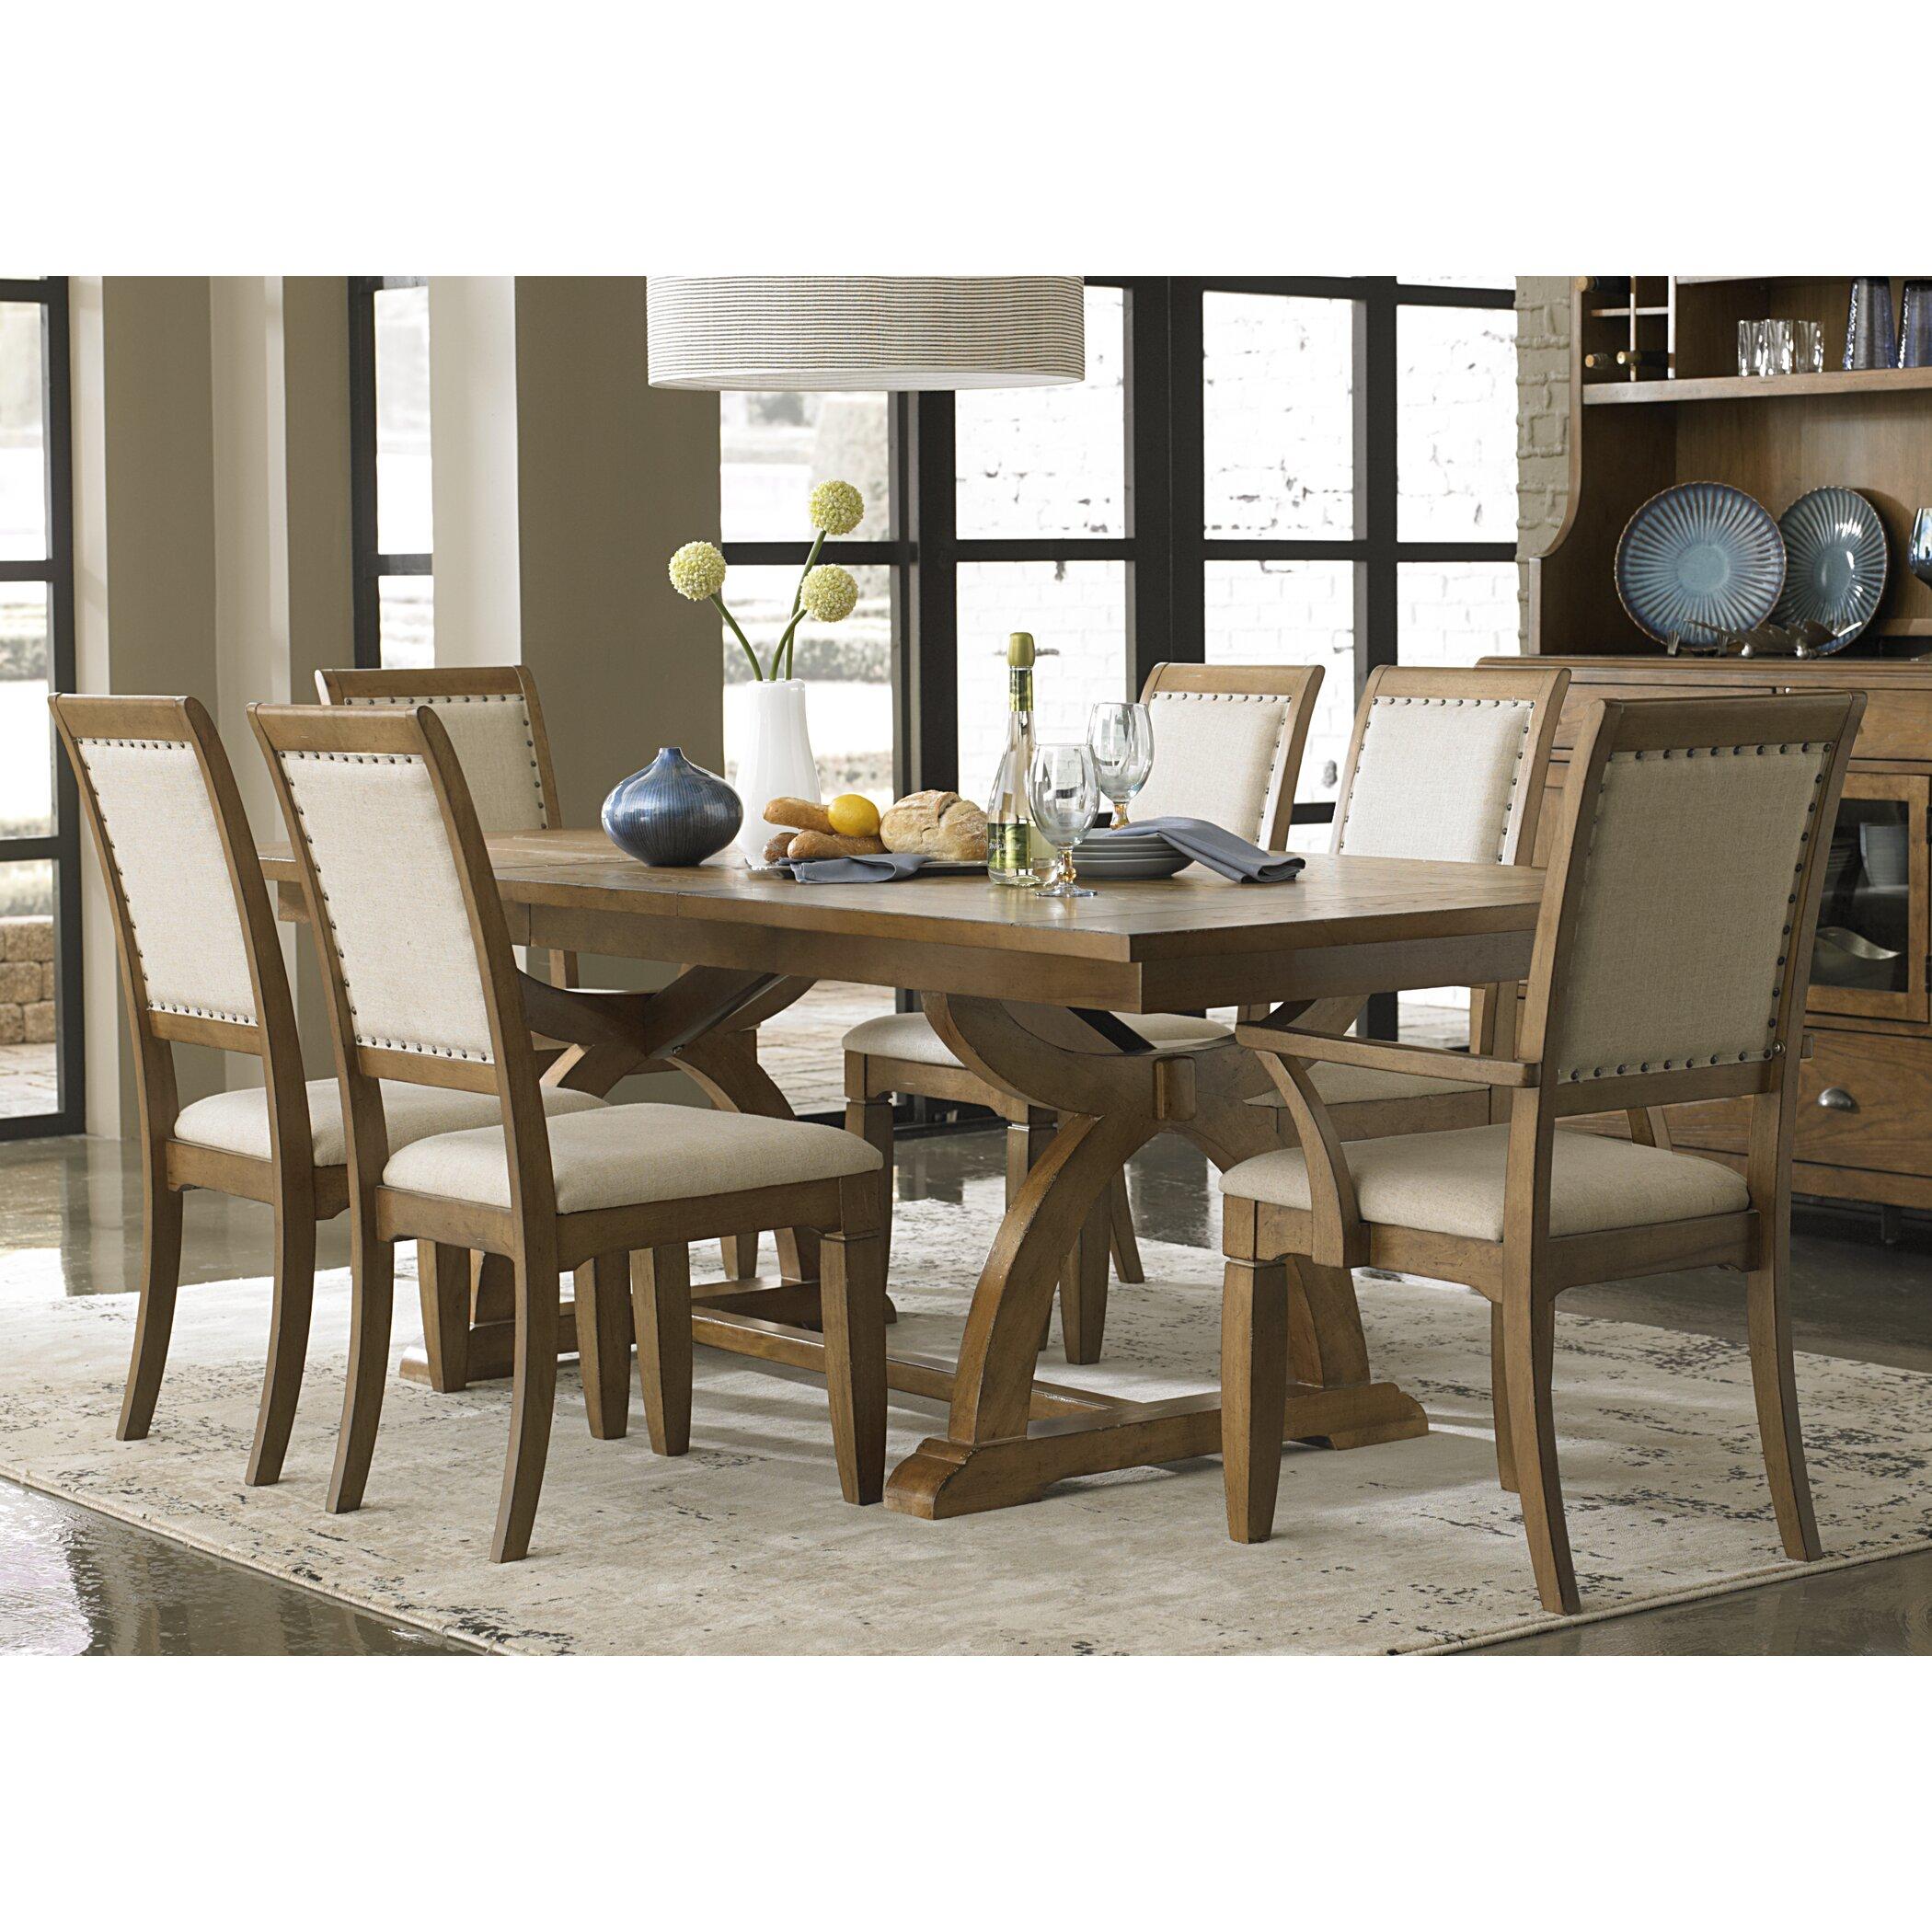 Lark manor 9 piece dining set reviews wayfair for Dining room tables 9 piece